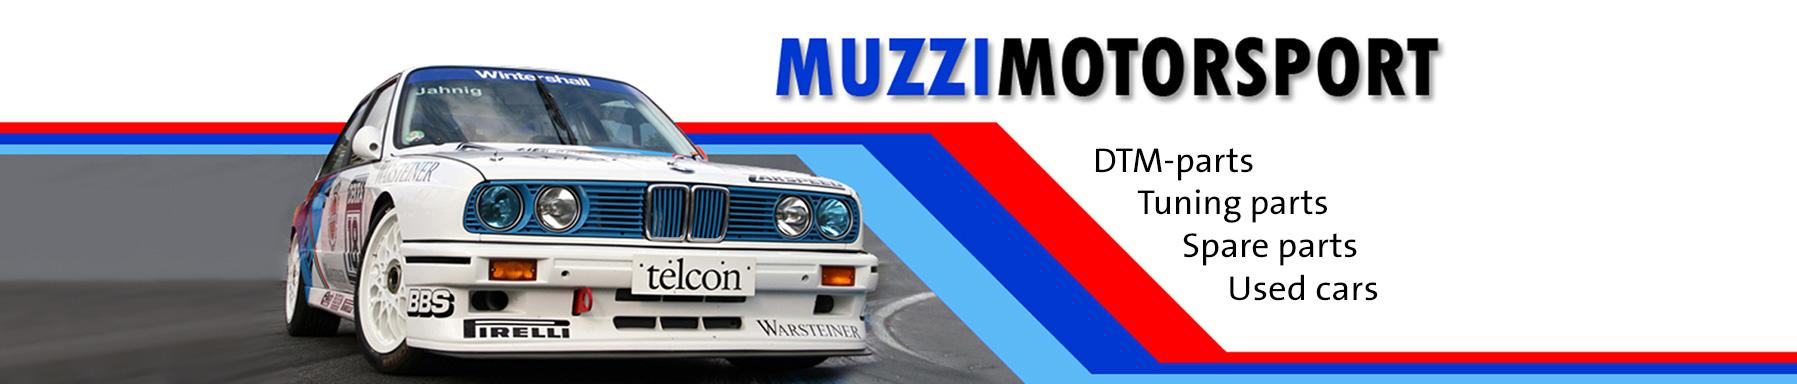 Muzzi Motorsport Telfs Tyrol Austria